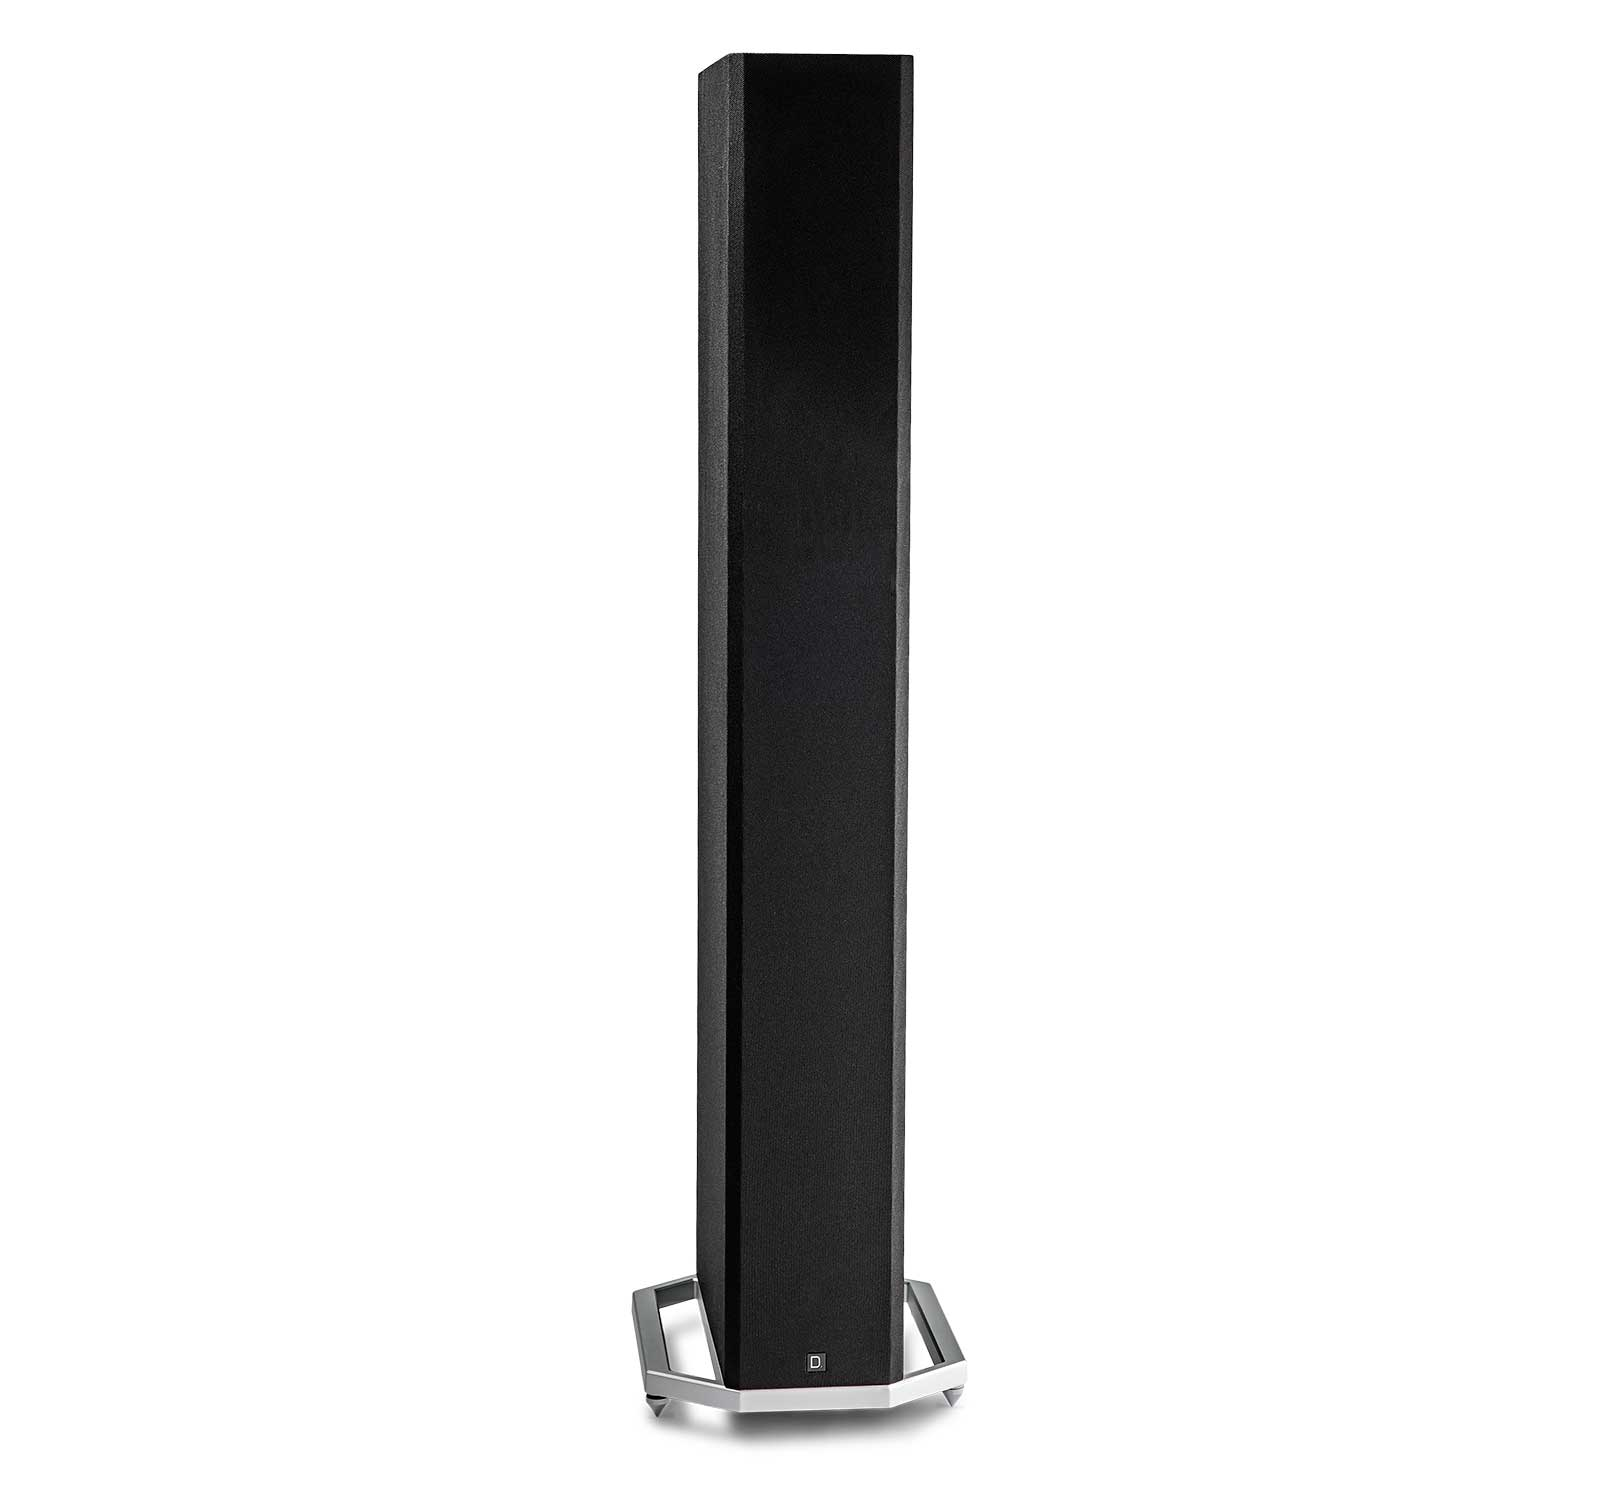 Image of the BP9060 Tower Speaker